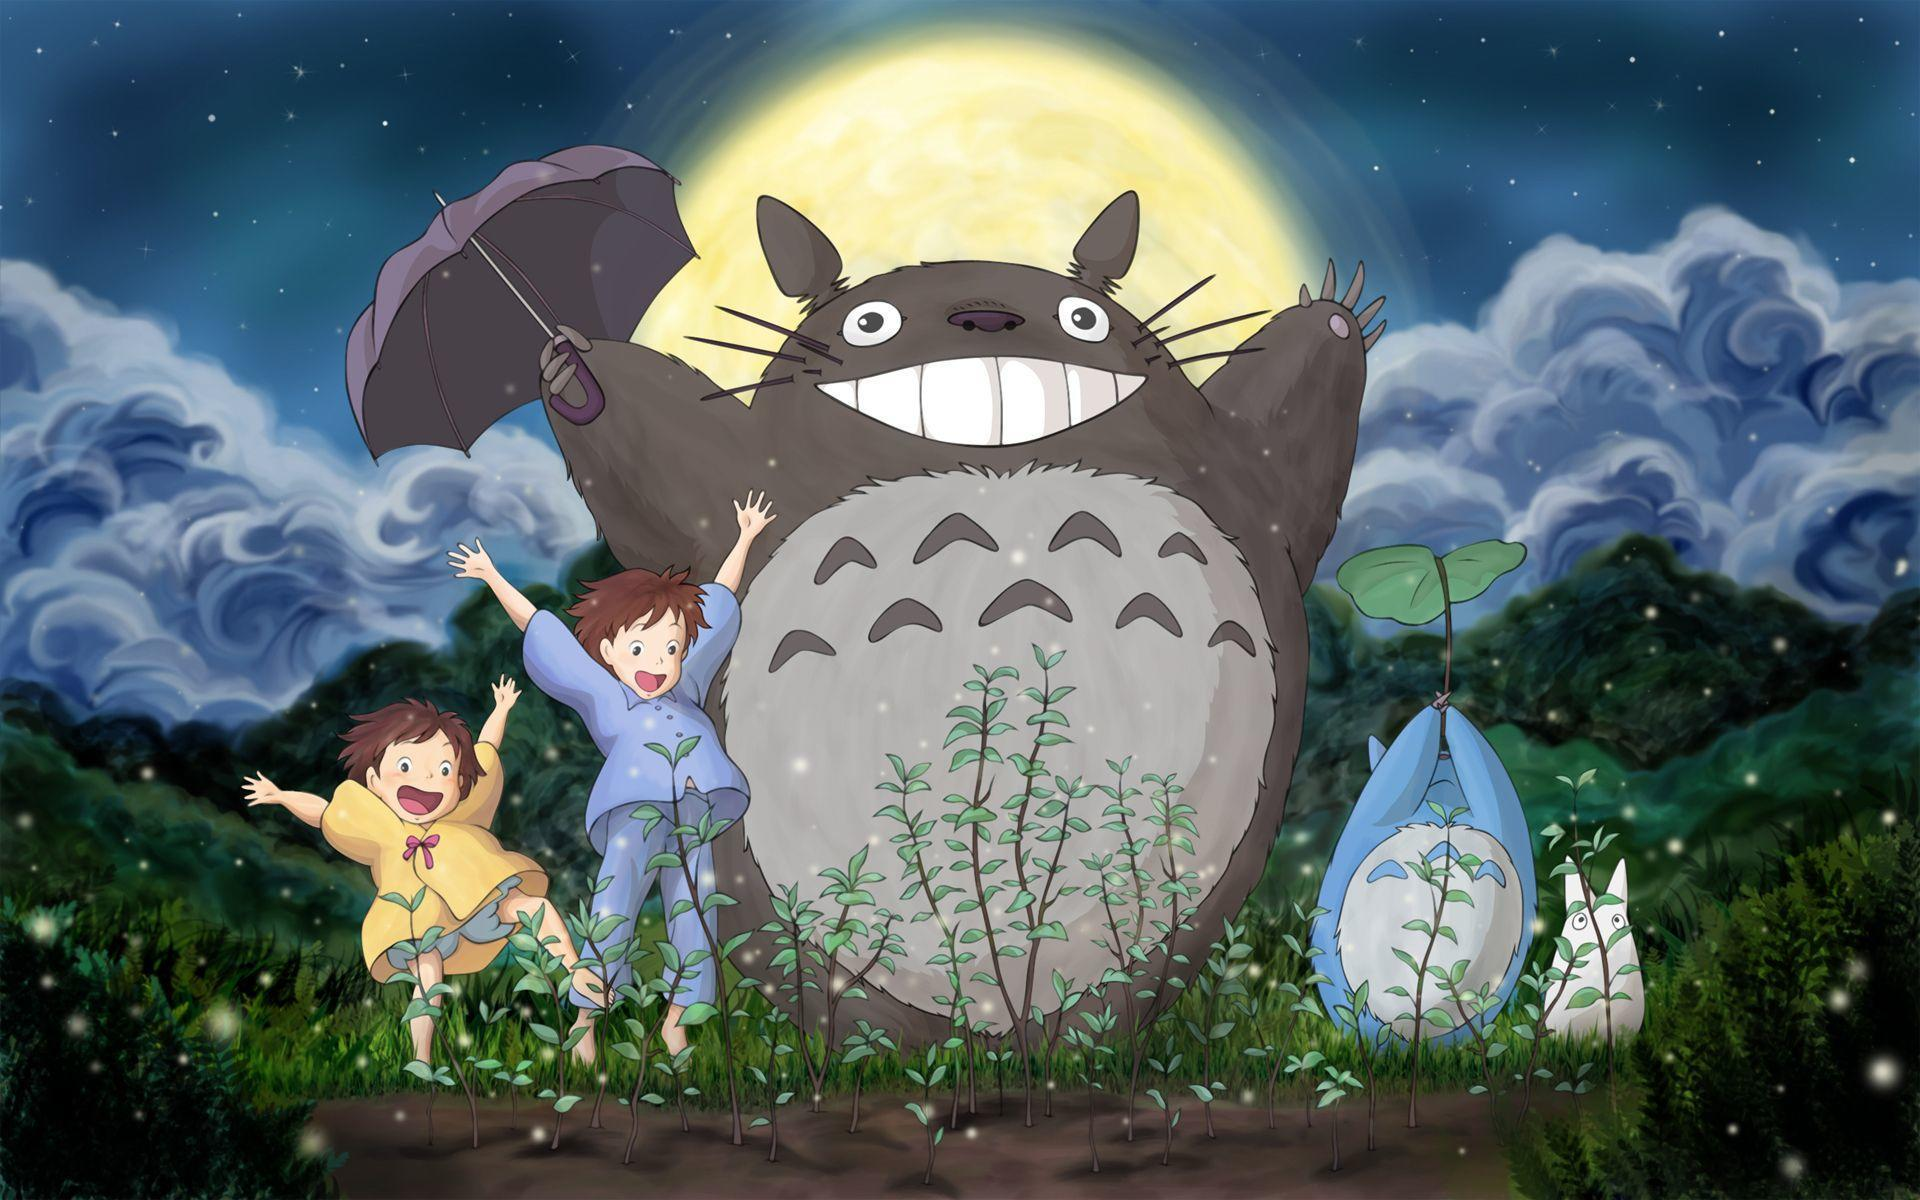 my-neighbor-totoro-may-satsuki-totoro-moon-hayao-miyazaki-139955